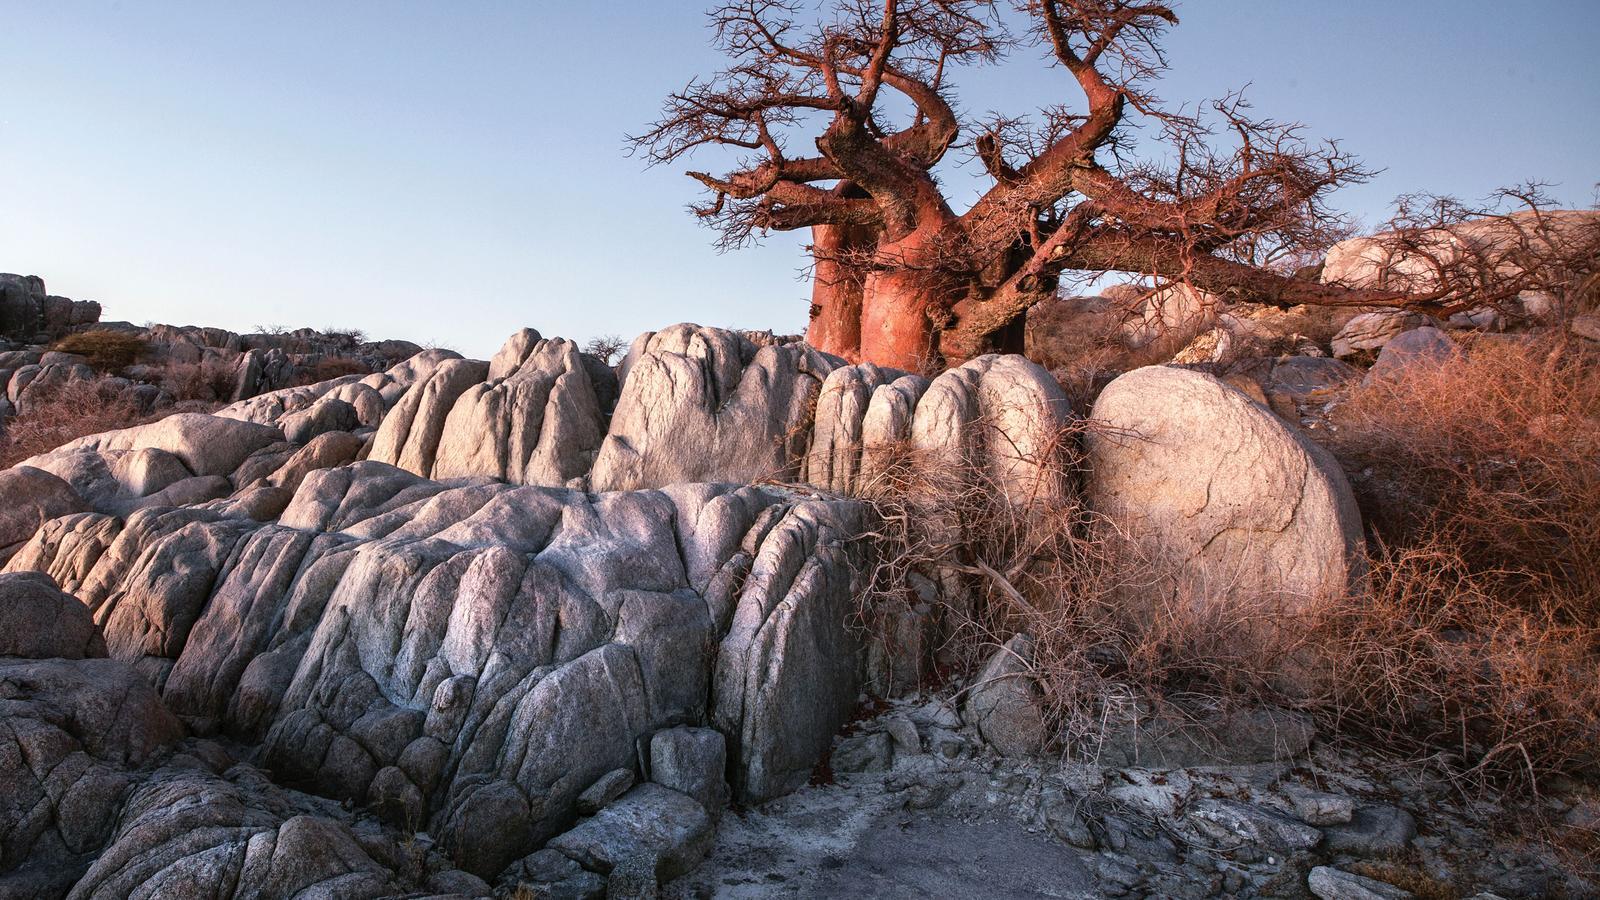 Kruger, Victoria Falls & Botswana Safari in South Africa